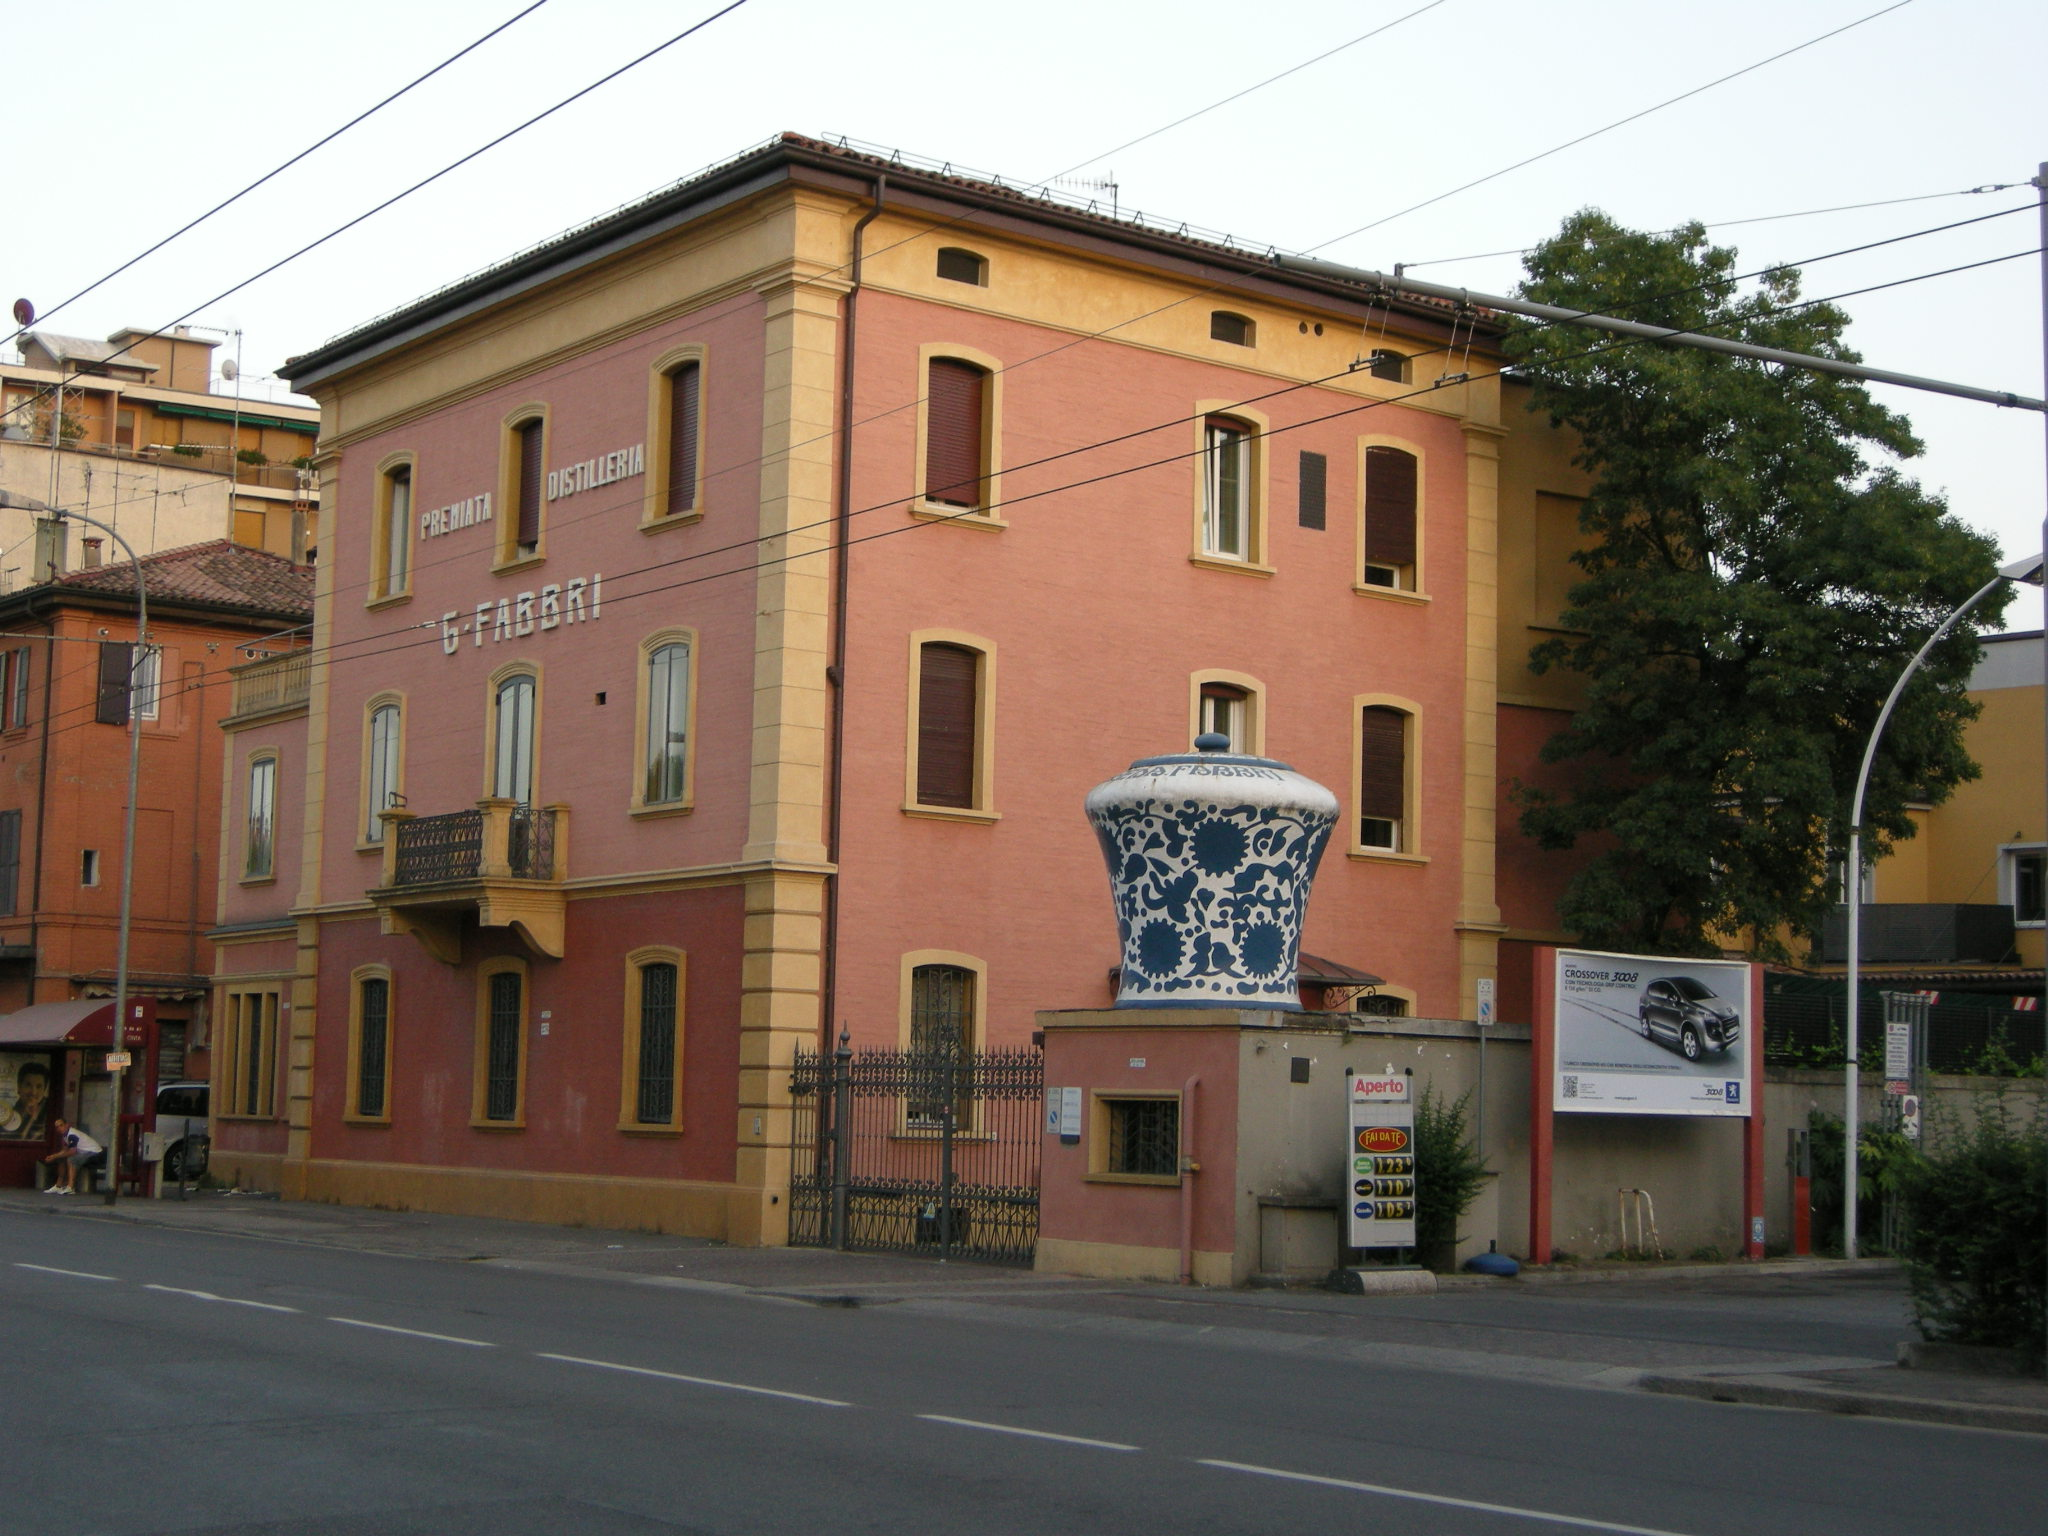 File:Borgo panigale, via emilia, manifattura fabbri 00.JPG ...